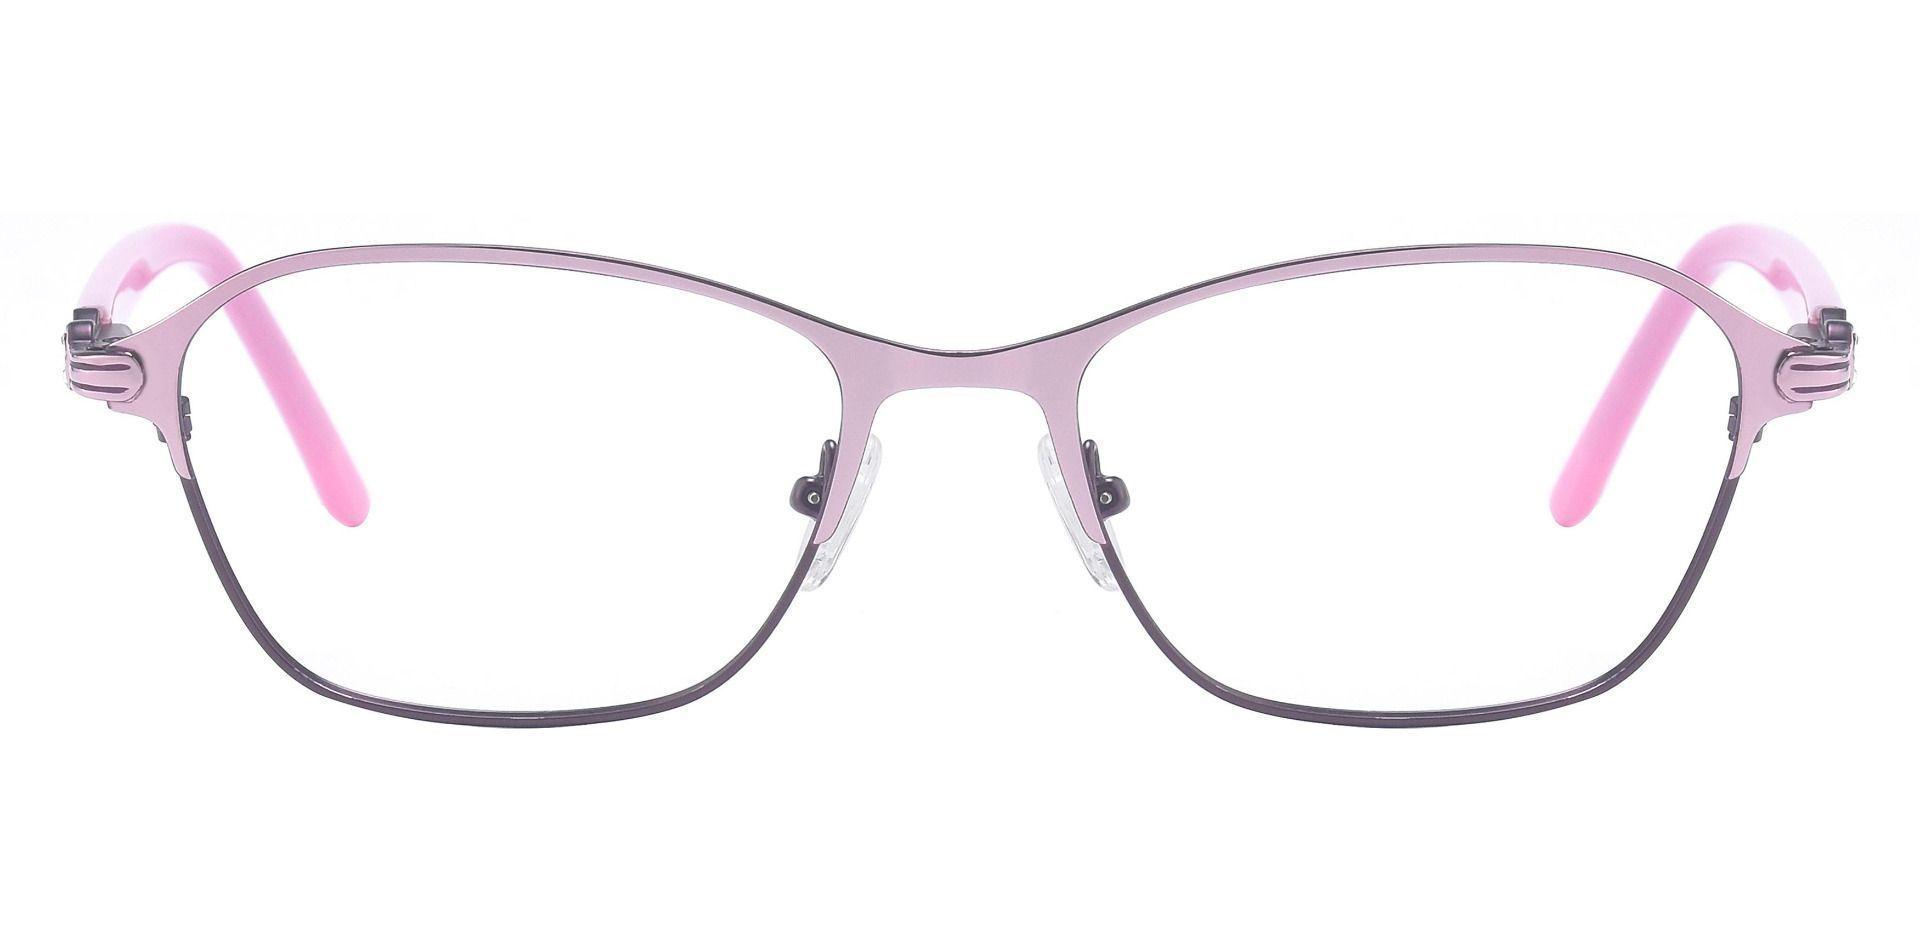 Maria Geometric Reading Glasses - Rose Gold